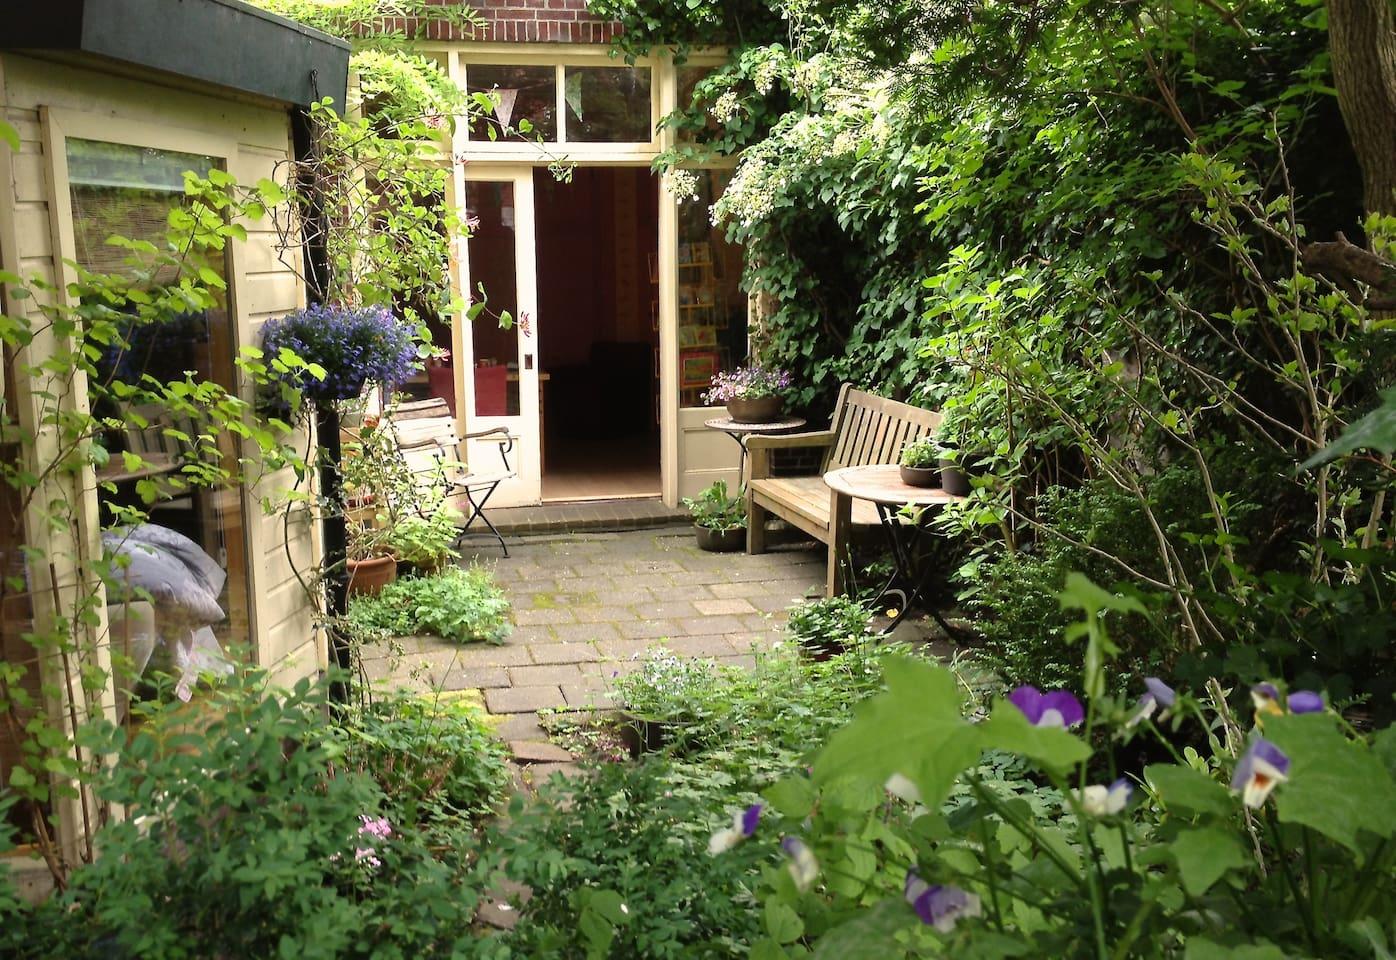 Privacy in de tuin vol bloemen.